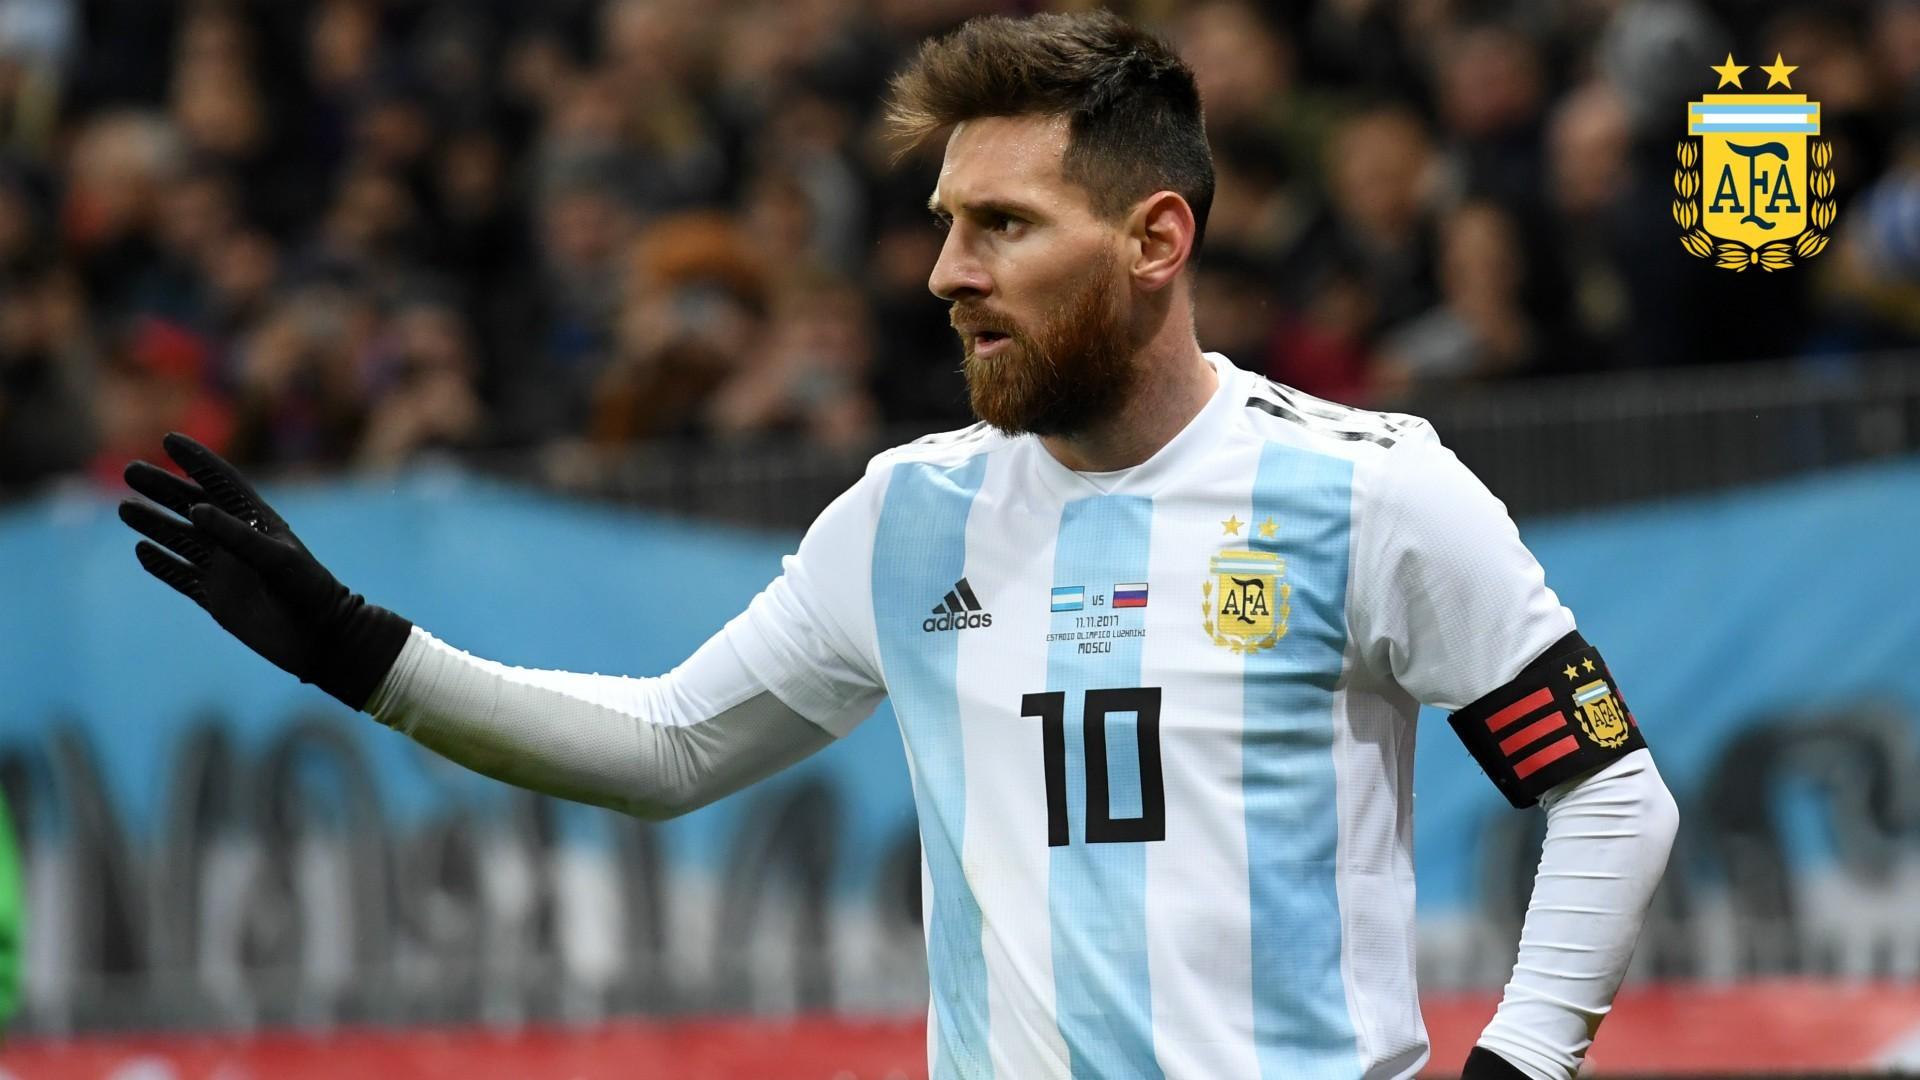 Messi Wallpaper 2018 HD (81+ images)